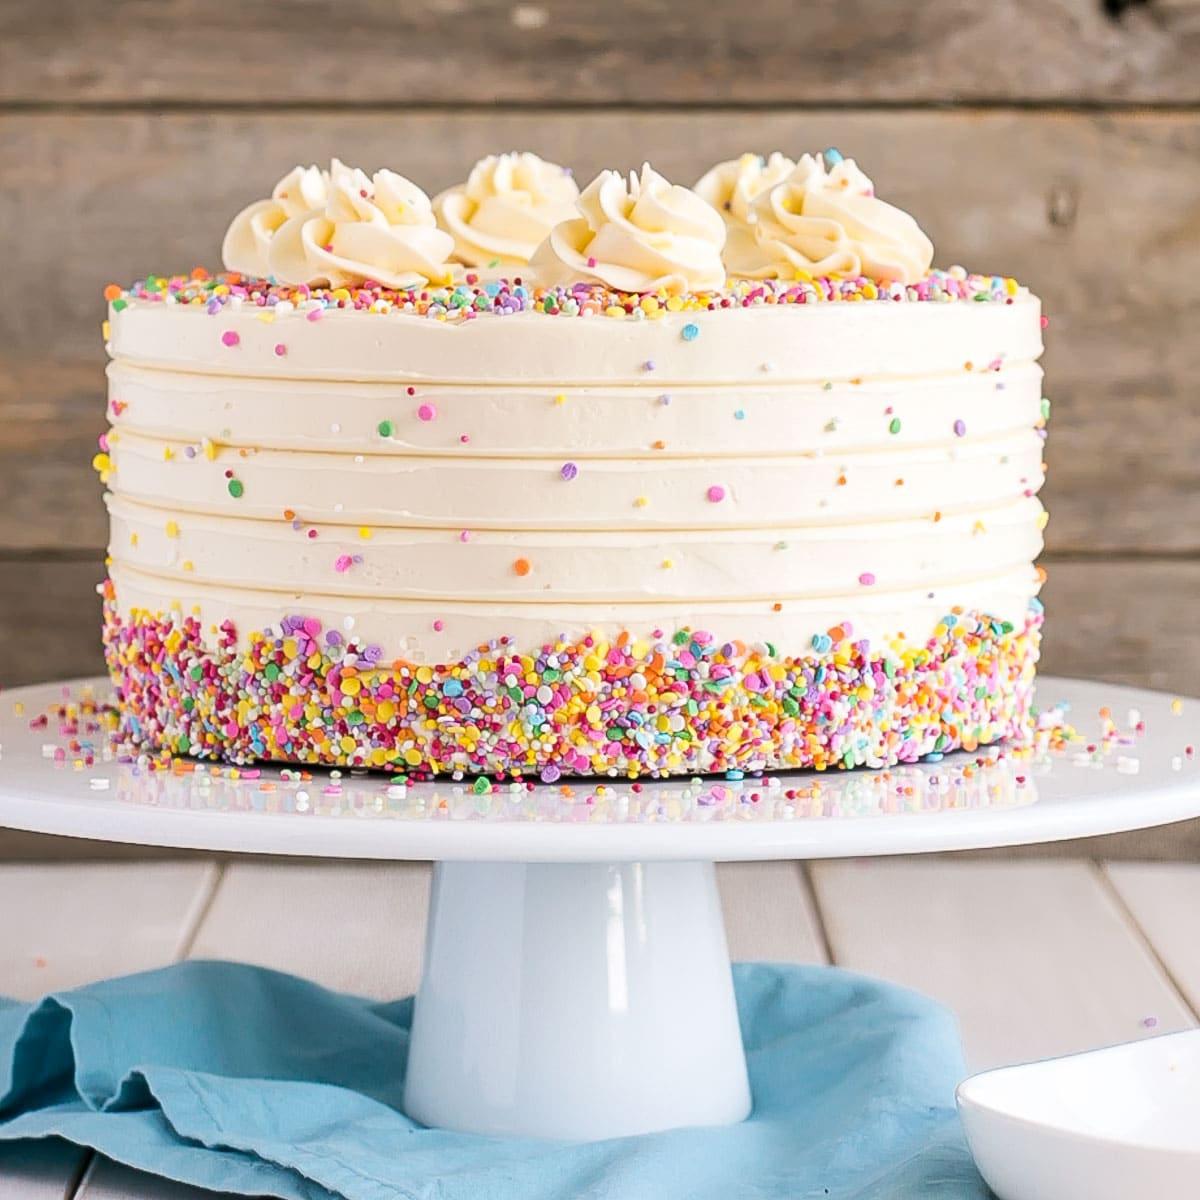 Cake Decorating - Buttercream